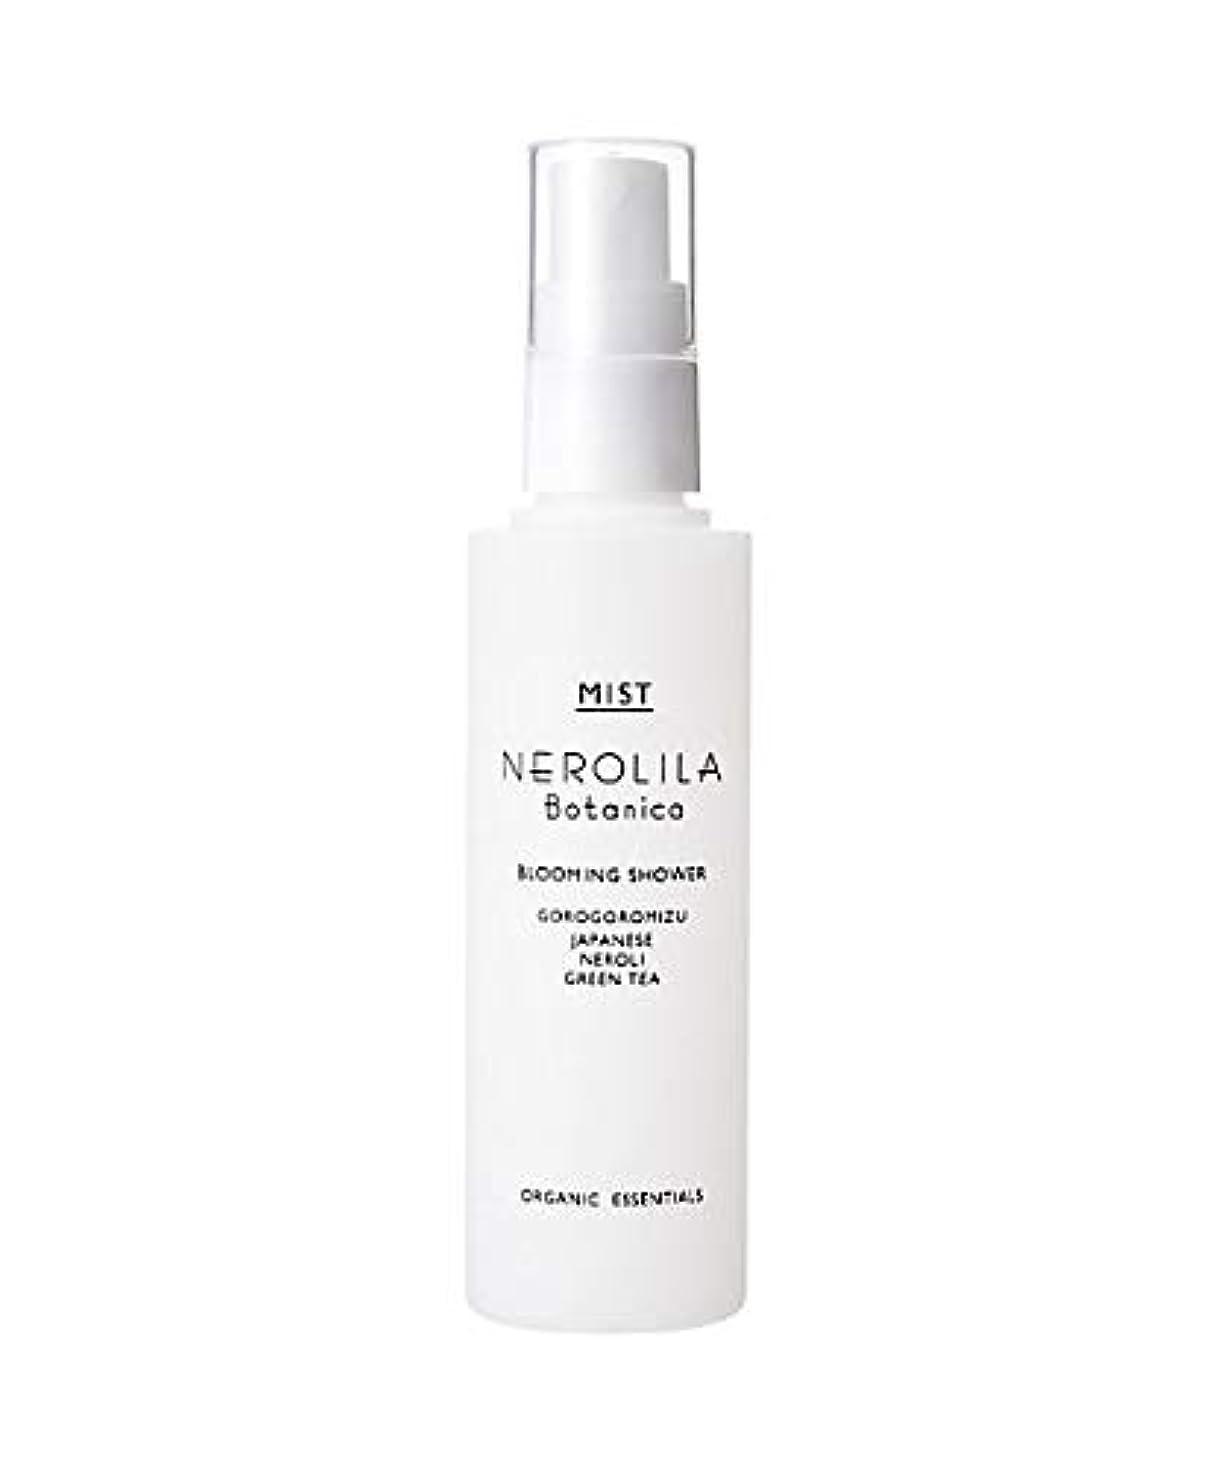 NEROLILA Botanica(ネロリラ ボタニカ)全身化粧水NR_100mL/化粧水